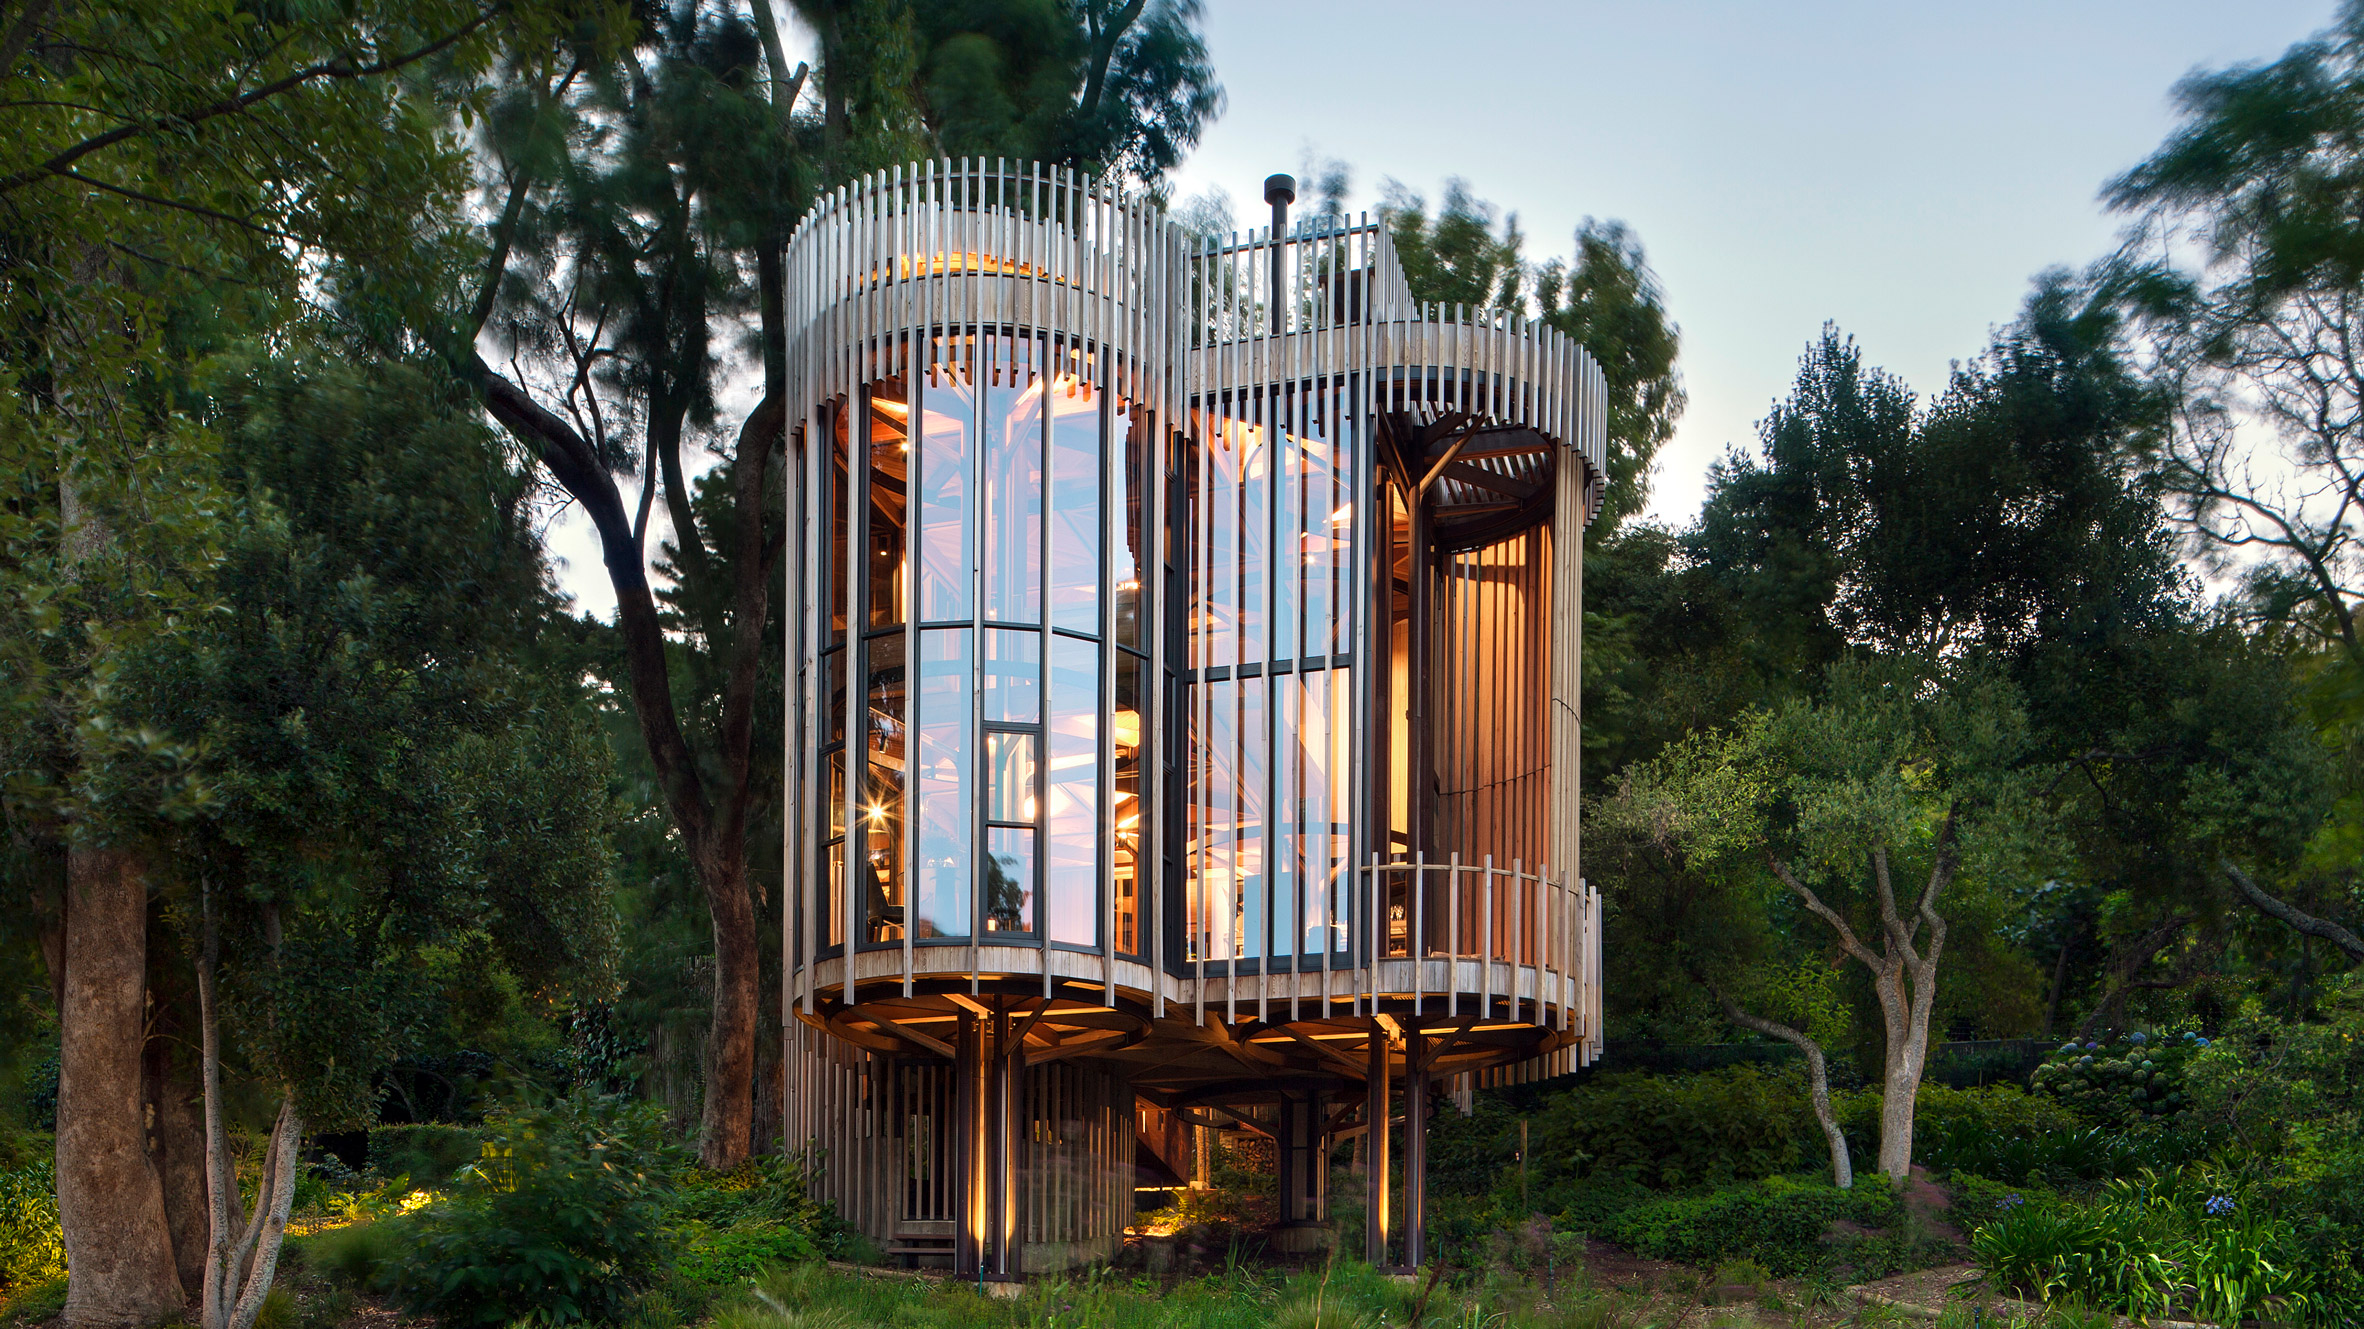 paarman-tree-house-by-mv-architecture-residential_dezeen_hero-1.jpg